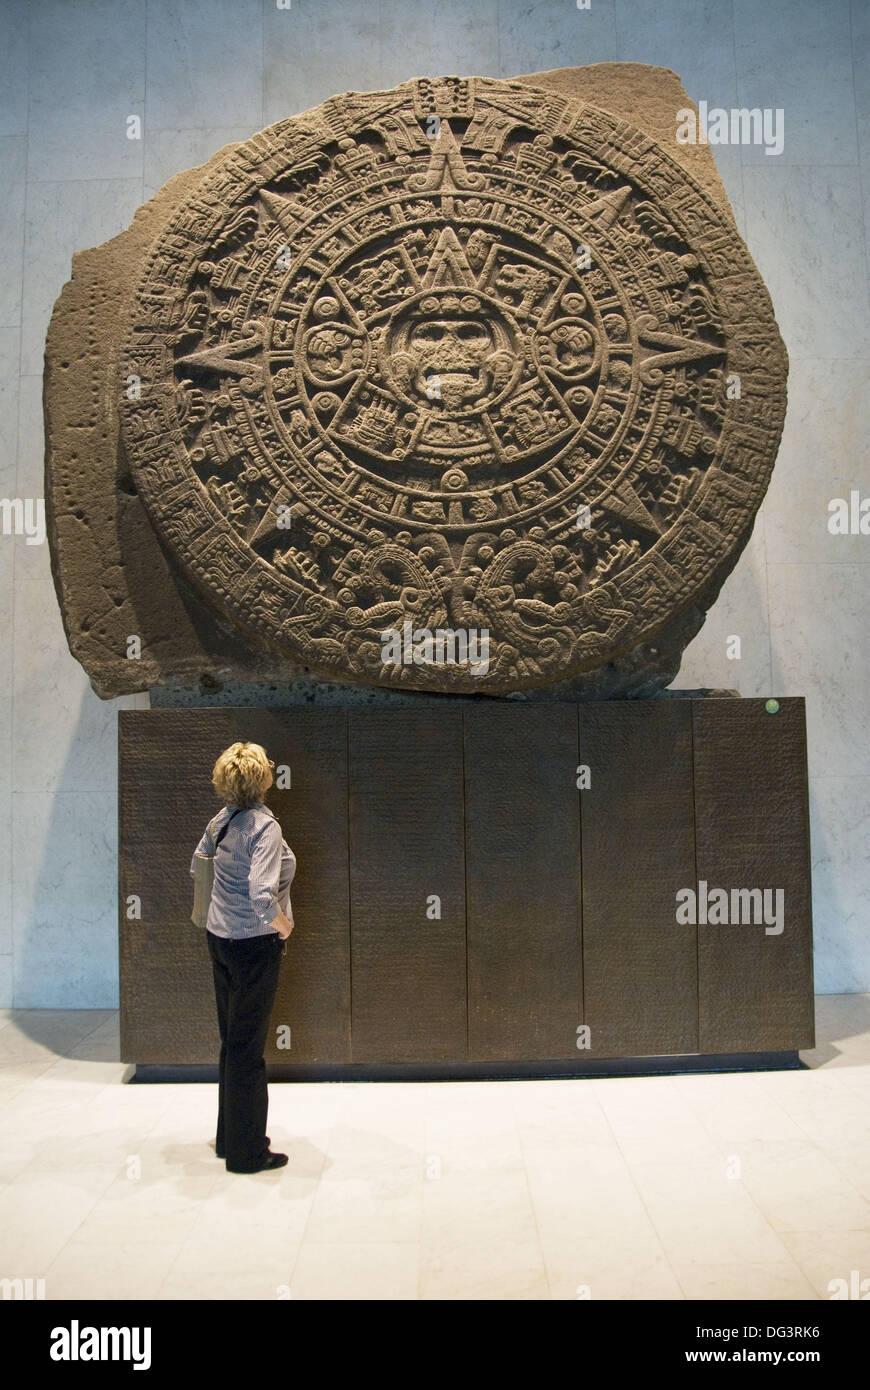 Mexico, Mexico City, Museo Nacional de Antropologia, tourist observing the famous ´sun stone´ - Stock Image